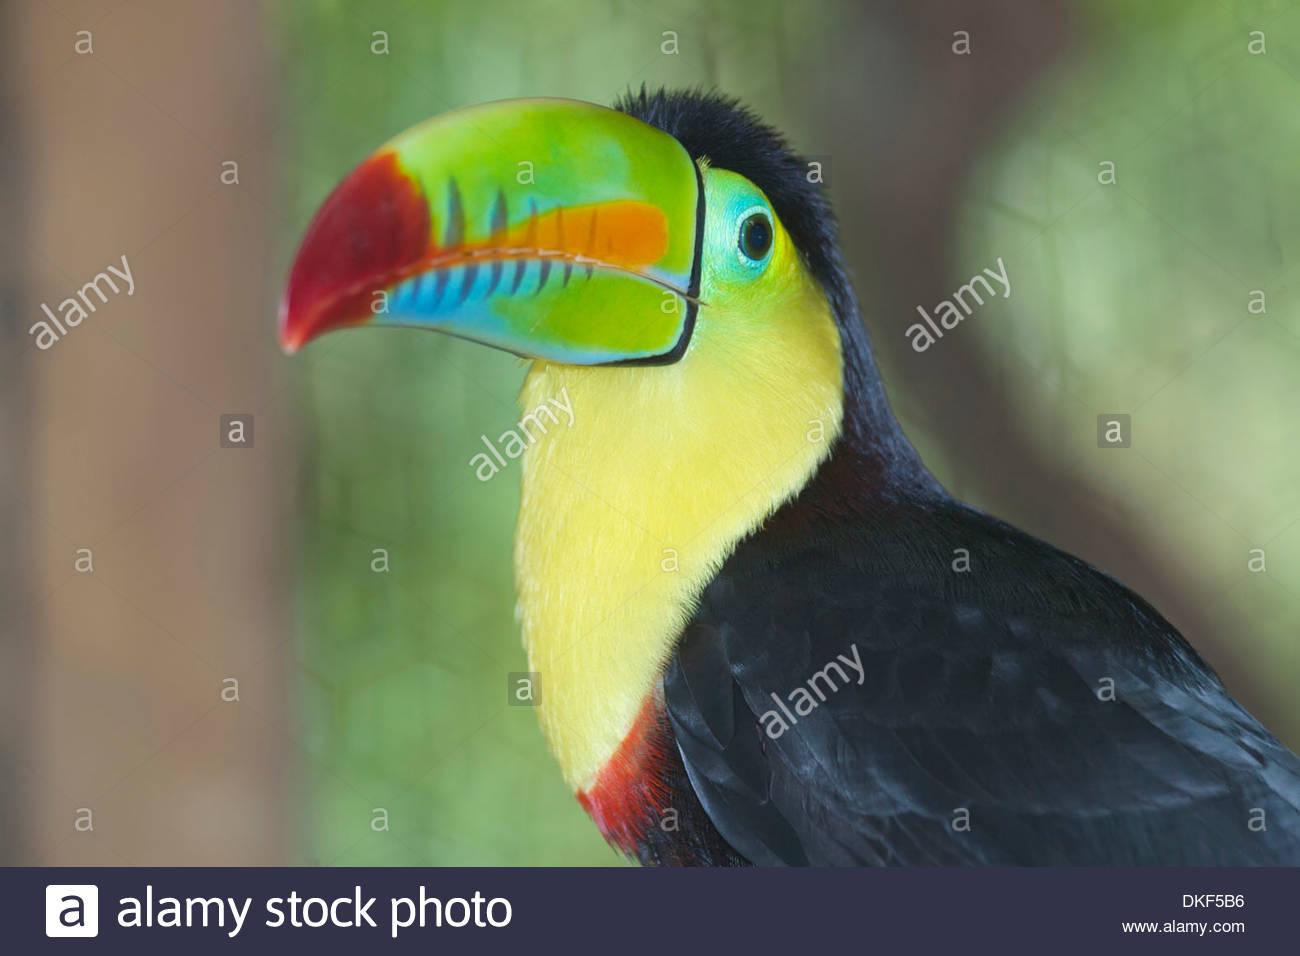 Keel-billed toucan (Ramphastos sulfuratus), San Jose, Costa Rica - Stock Image